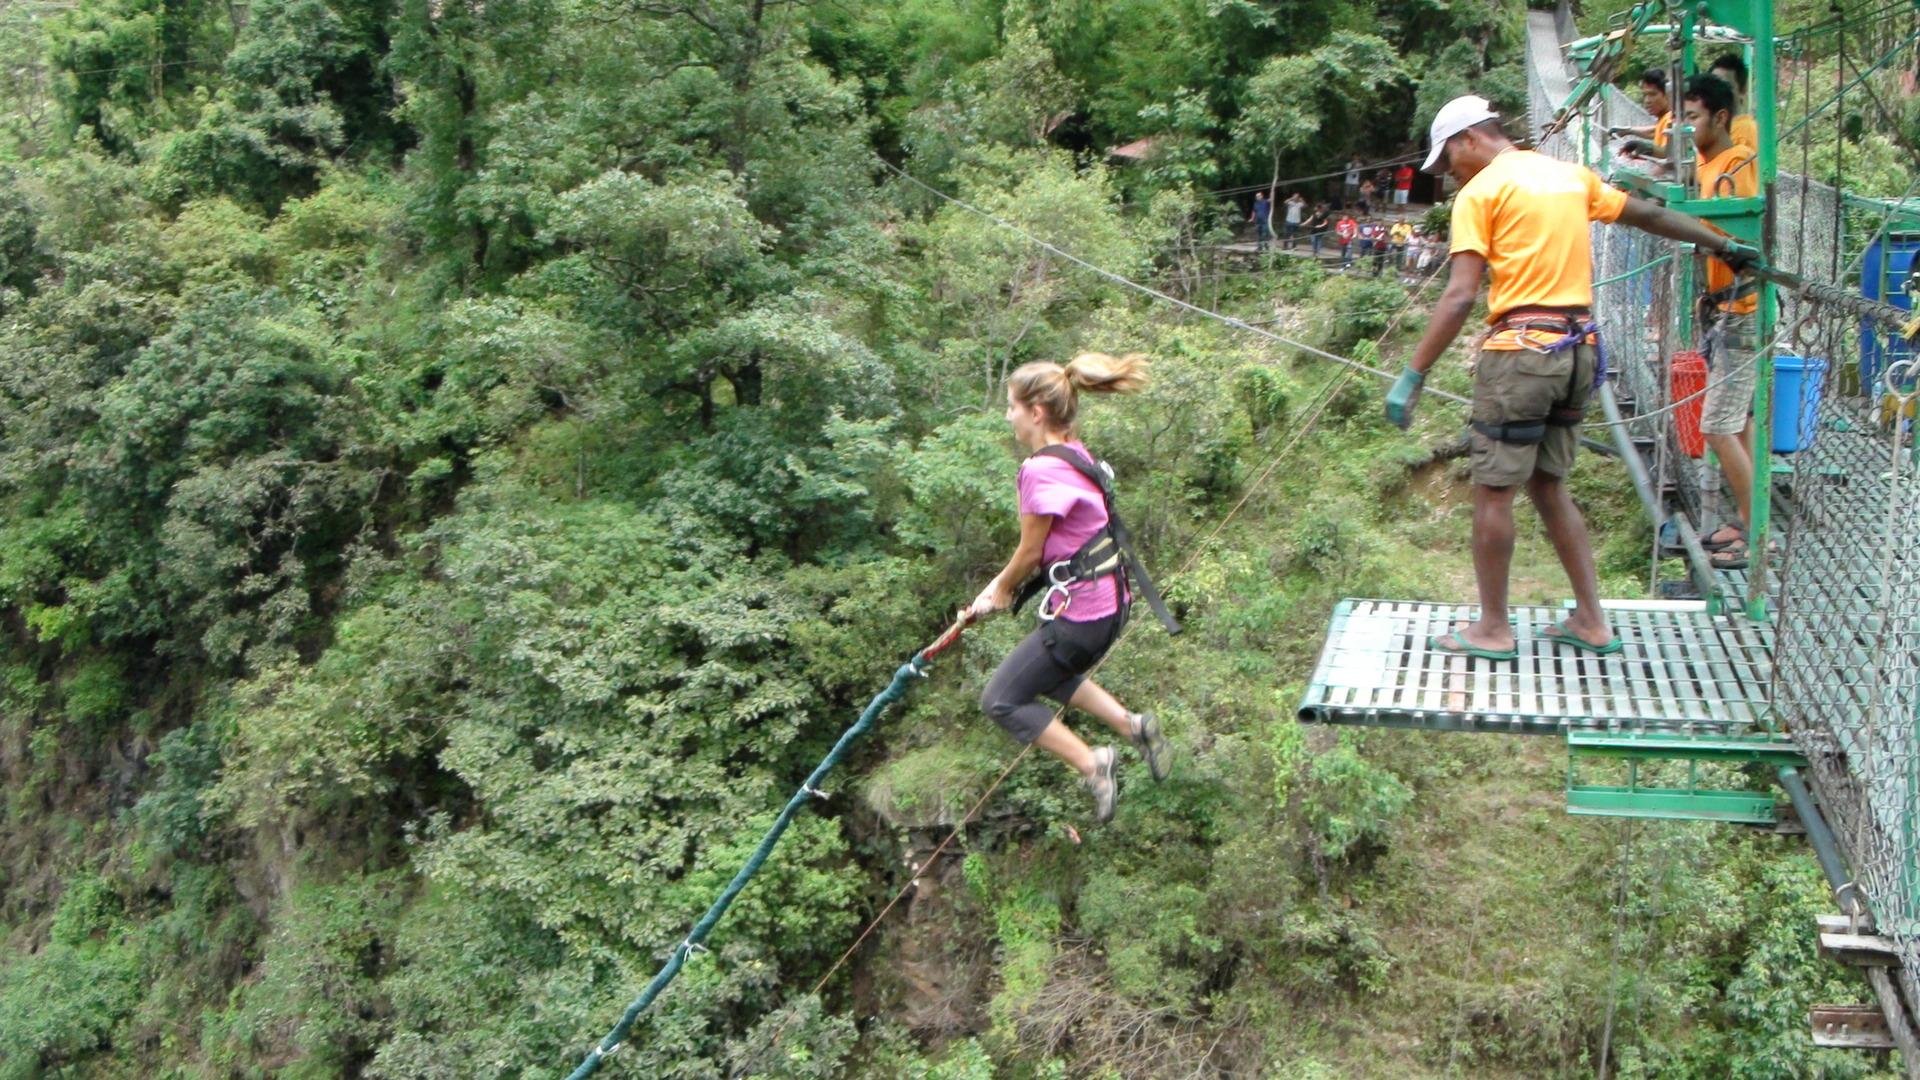 Erica Bungee Jump 2